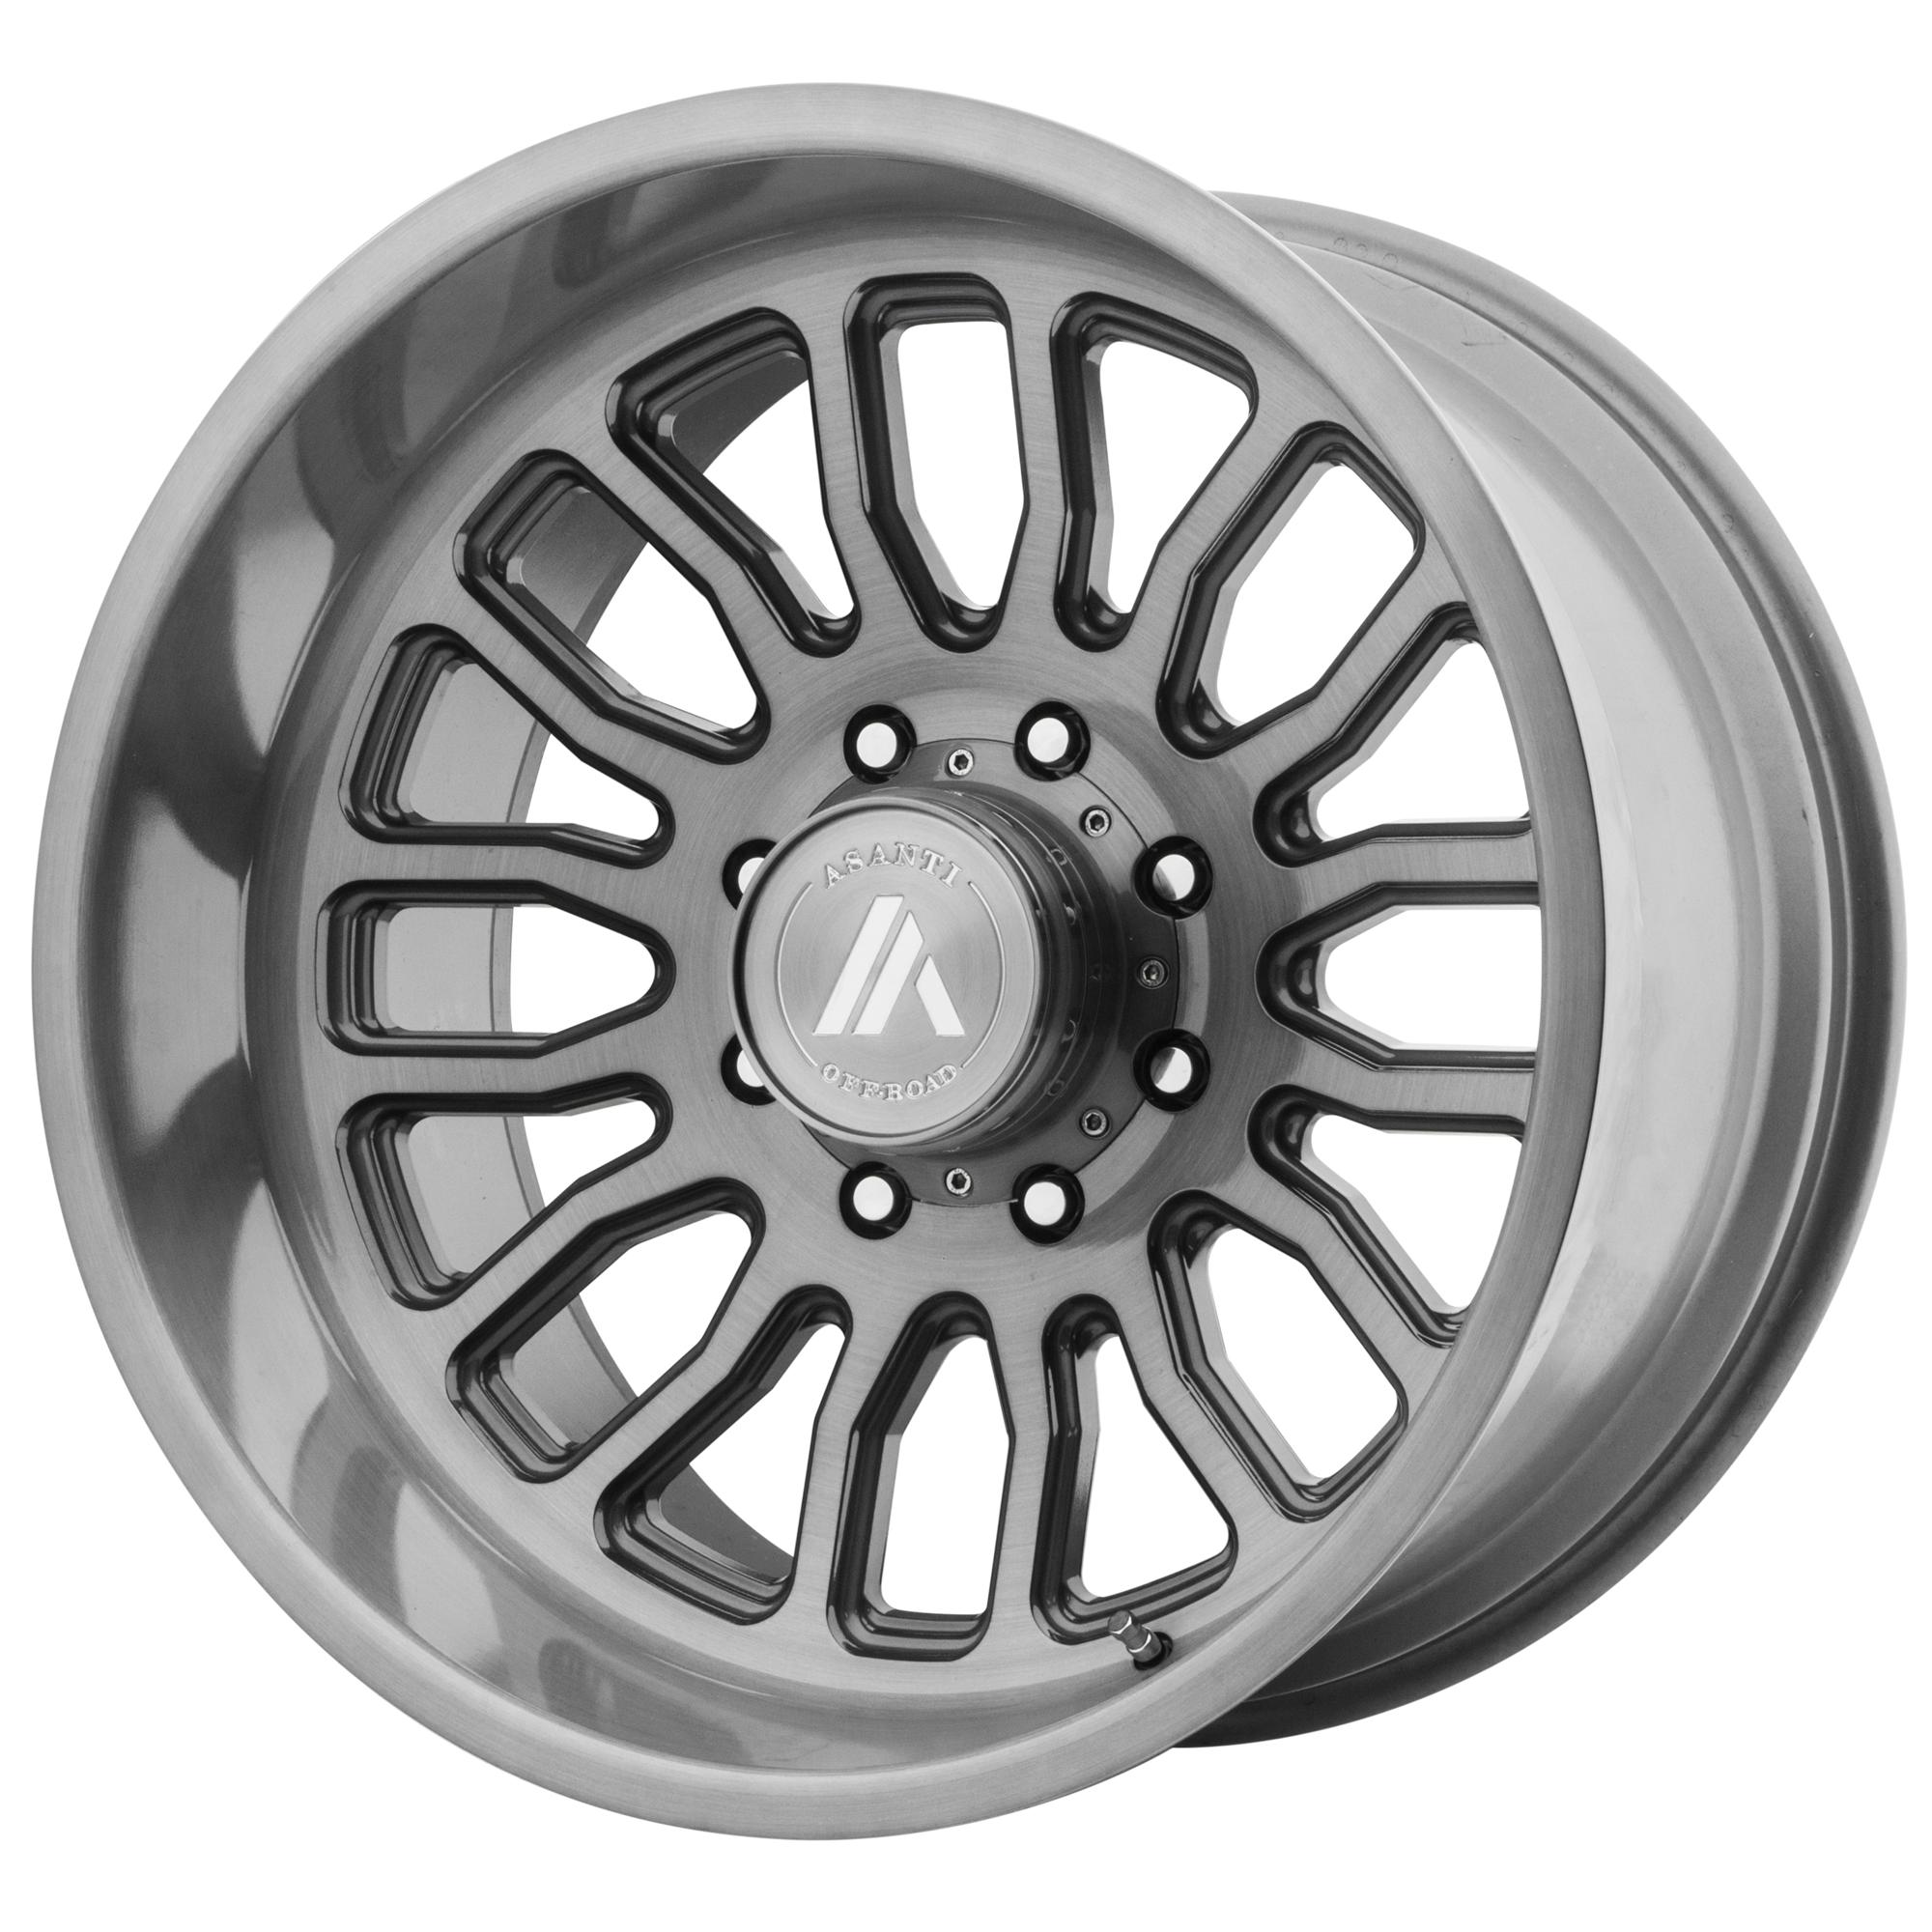 ASANTI OFF ROAD AB815 WORKHORSE hliníkové disky 10x20 5x127 ET-12 Titanium-Brushed